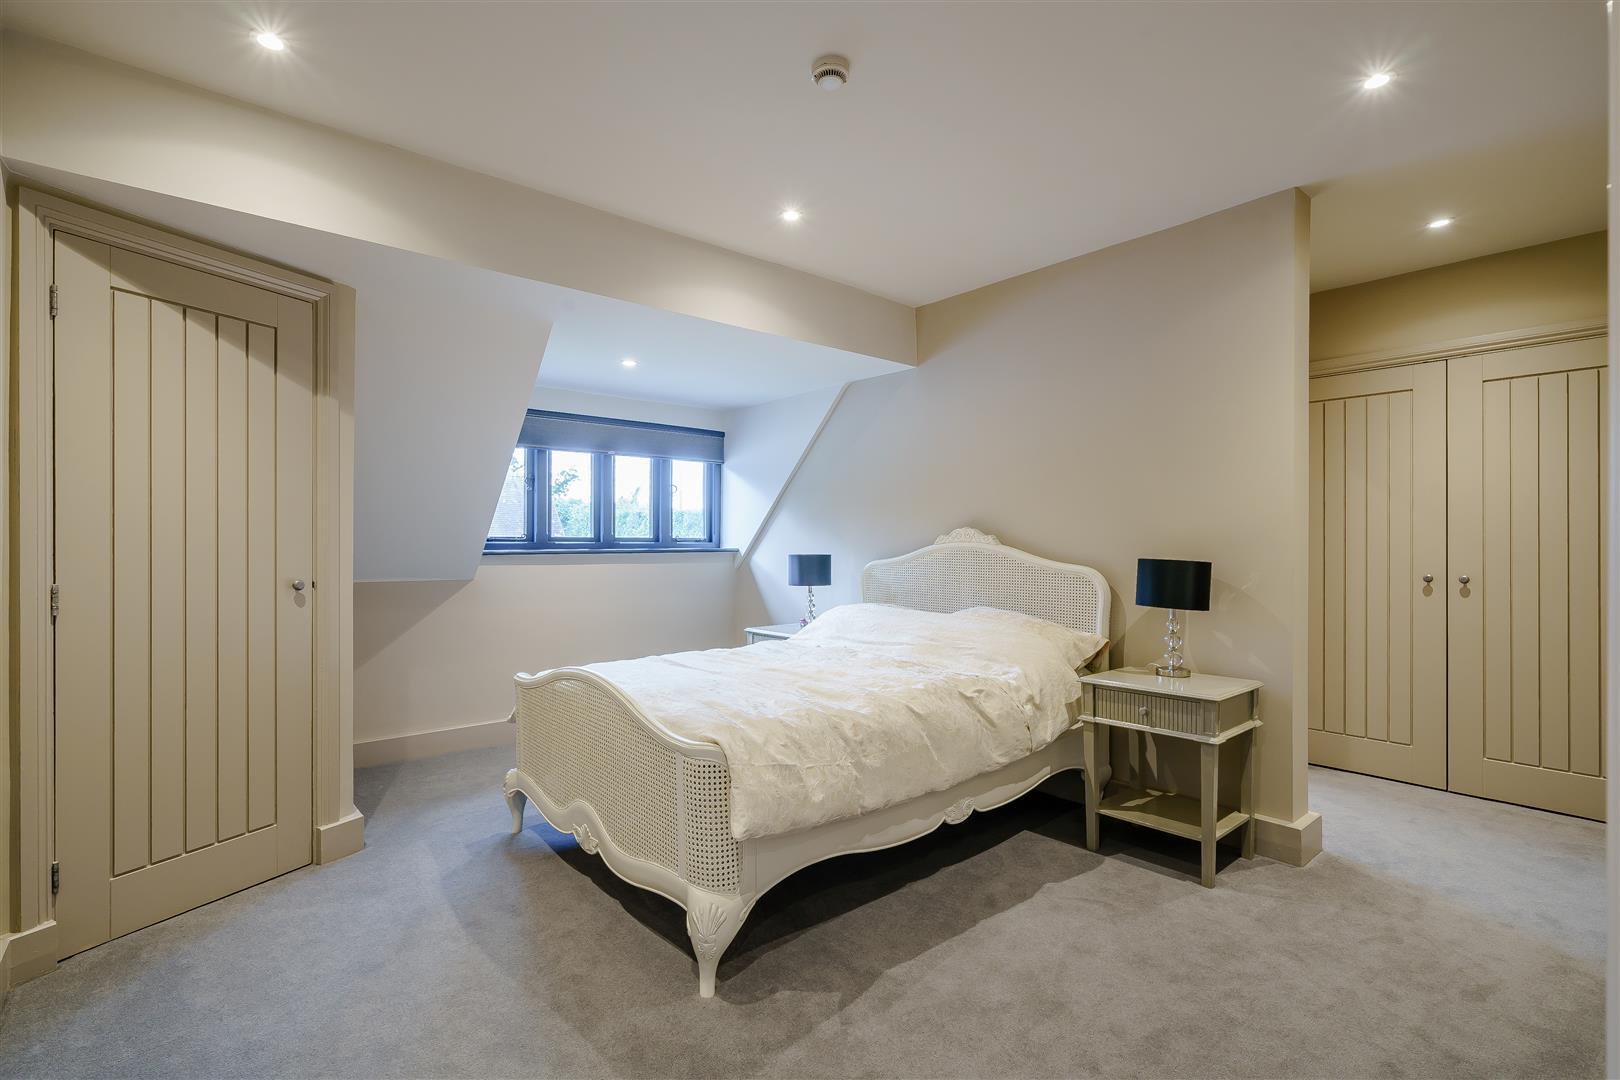 Rowstock Manor - Gallery Image 22 - Bedroom 3